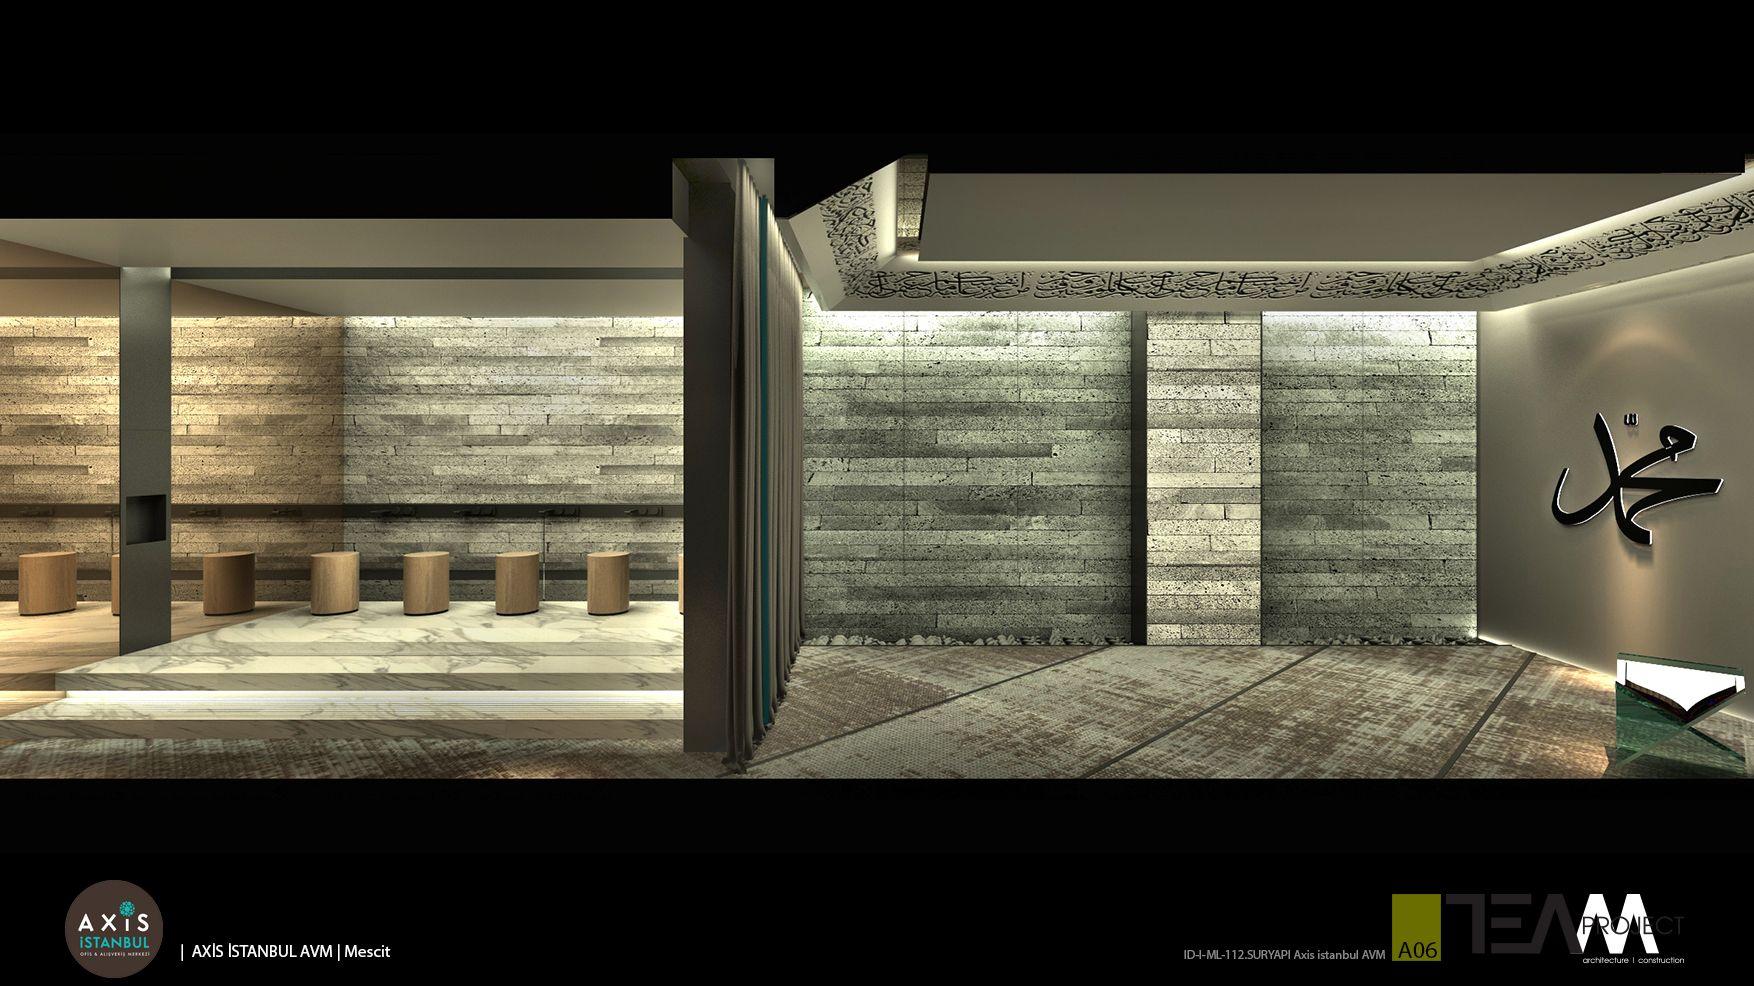 #architecture #interiordesign #design #içmimari #tasarim #mescit #mimarlık #icmimarlik #team #proje